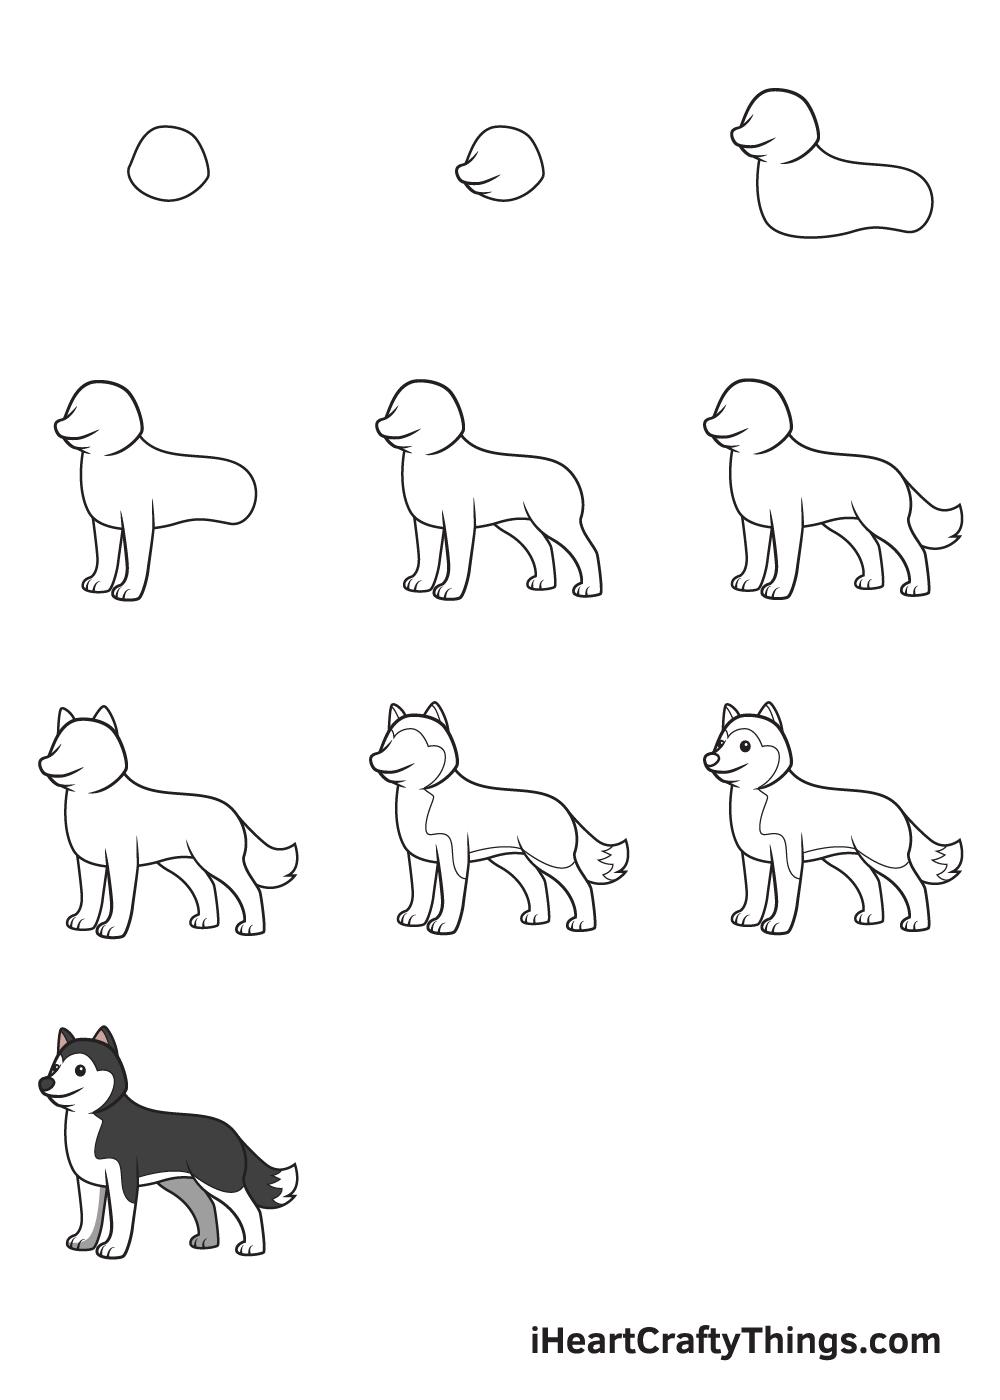 drawing husky in 9 steps